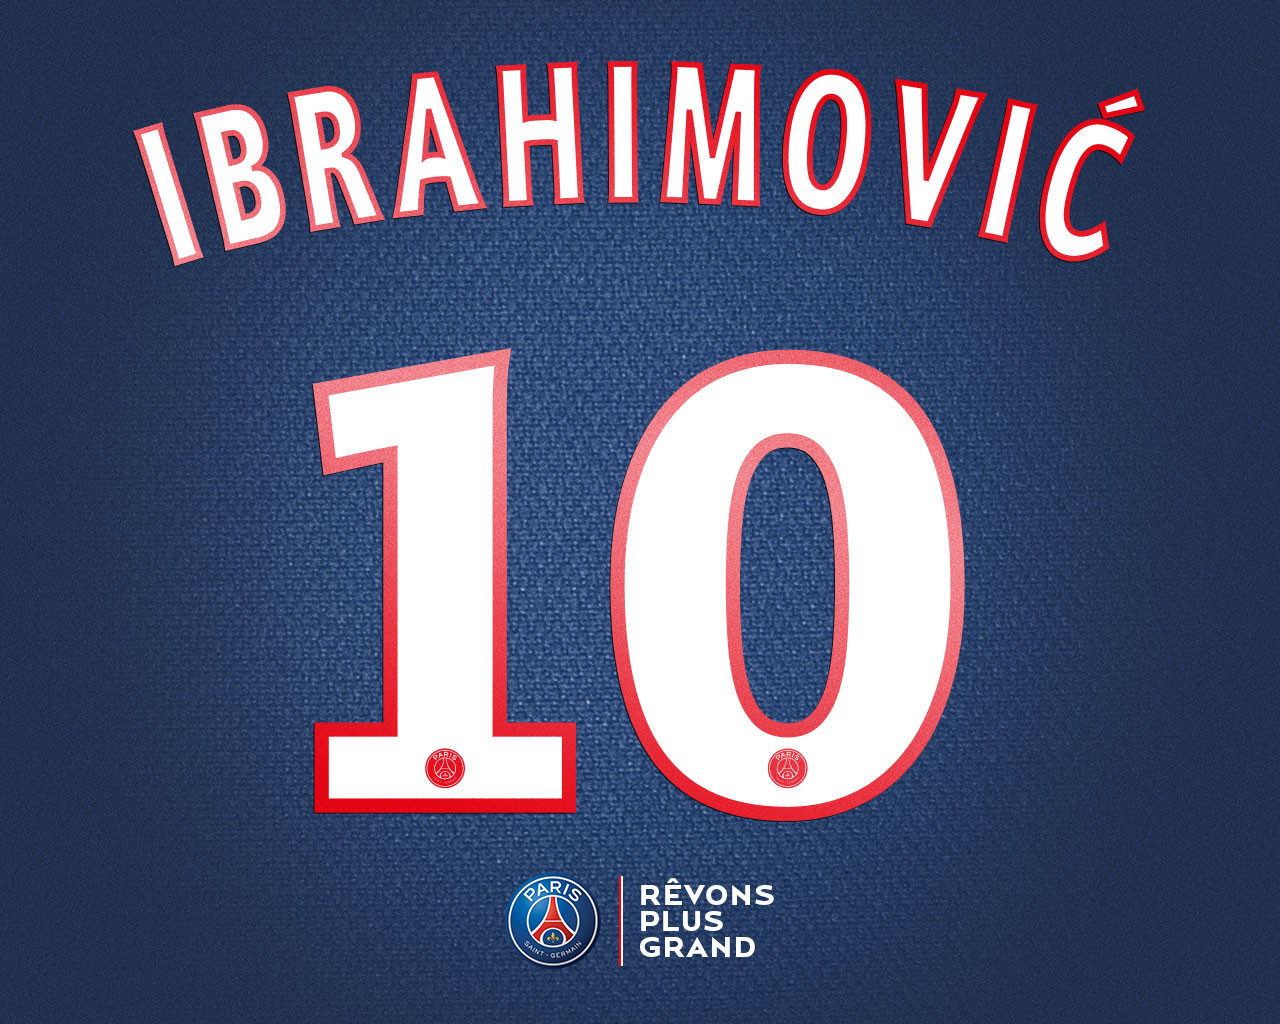 Ibrahimovic Zlatan   Player sheet   First Team   PSGfr 1280x1024